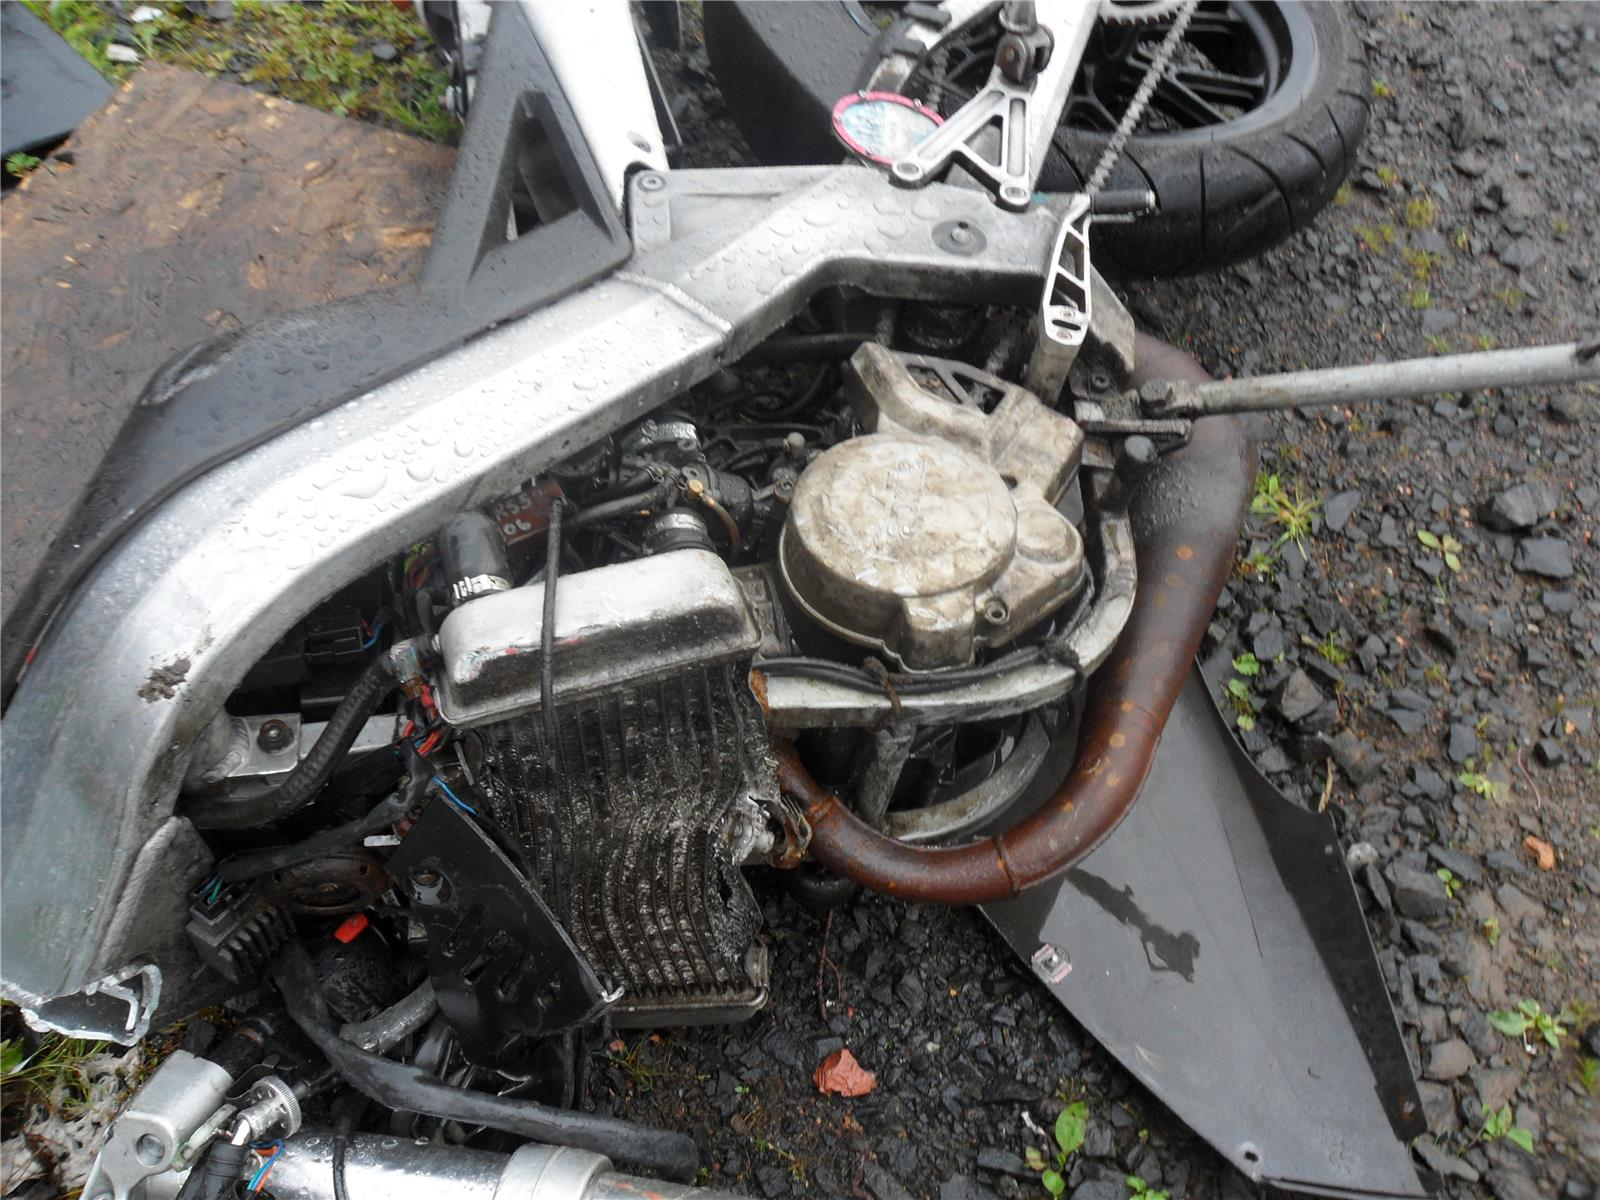 ... Aprilia RS 50 MOTORCYCLE ...